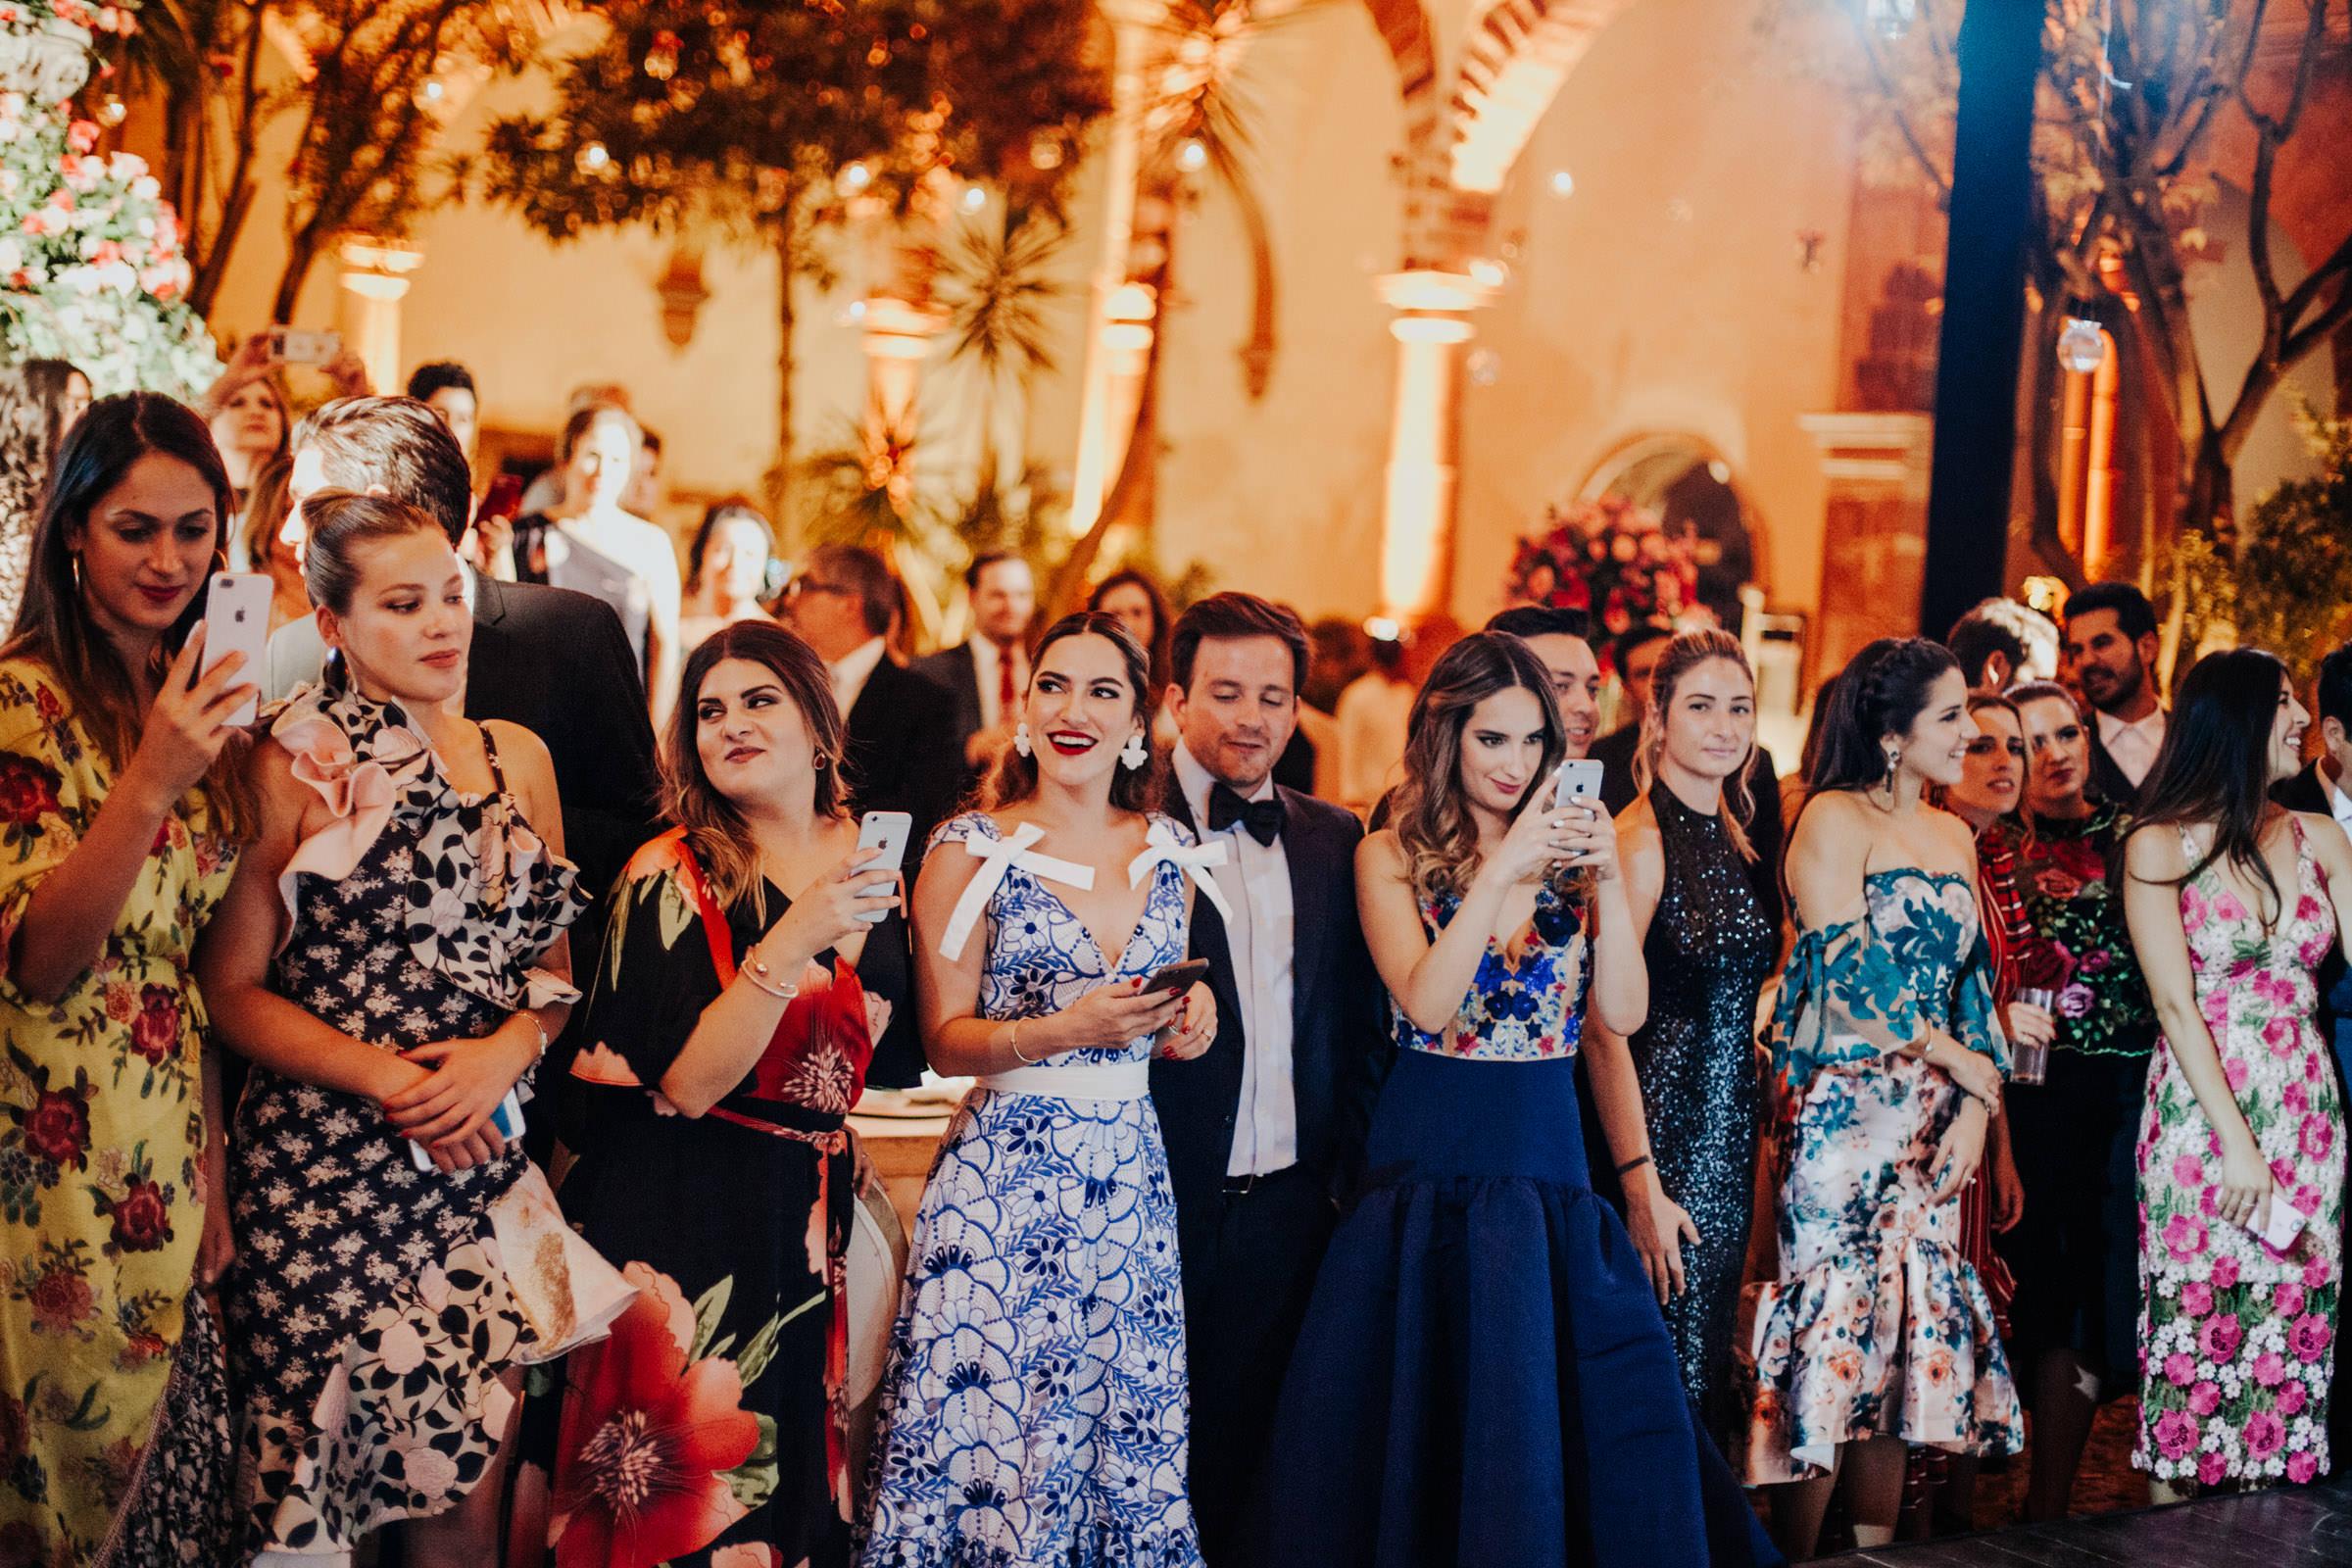 San-Miguel-de-Allende-Wedding-Photography-Parroquia-Instituto-Boda-Fotografia-Fer-Sergio-Pierce-Lifestyle-Photography0023.JPG